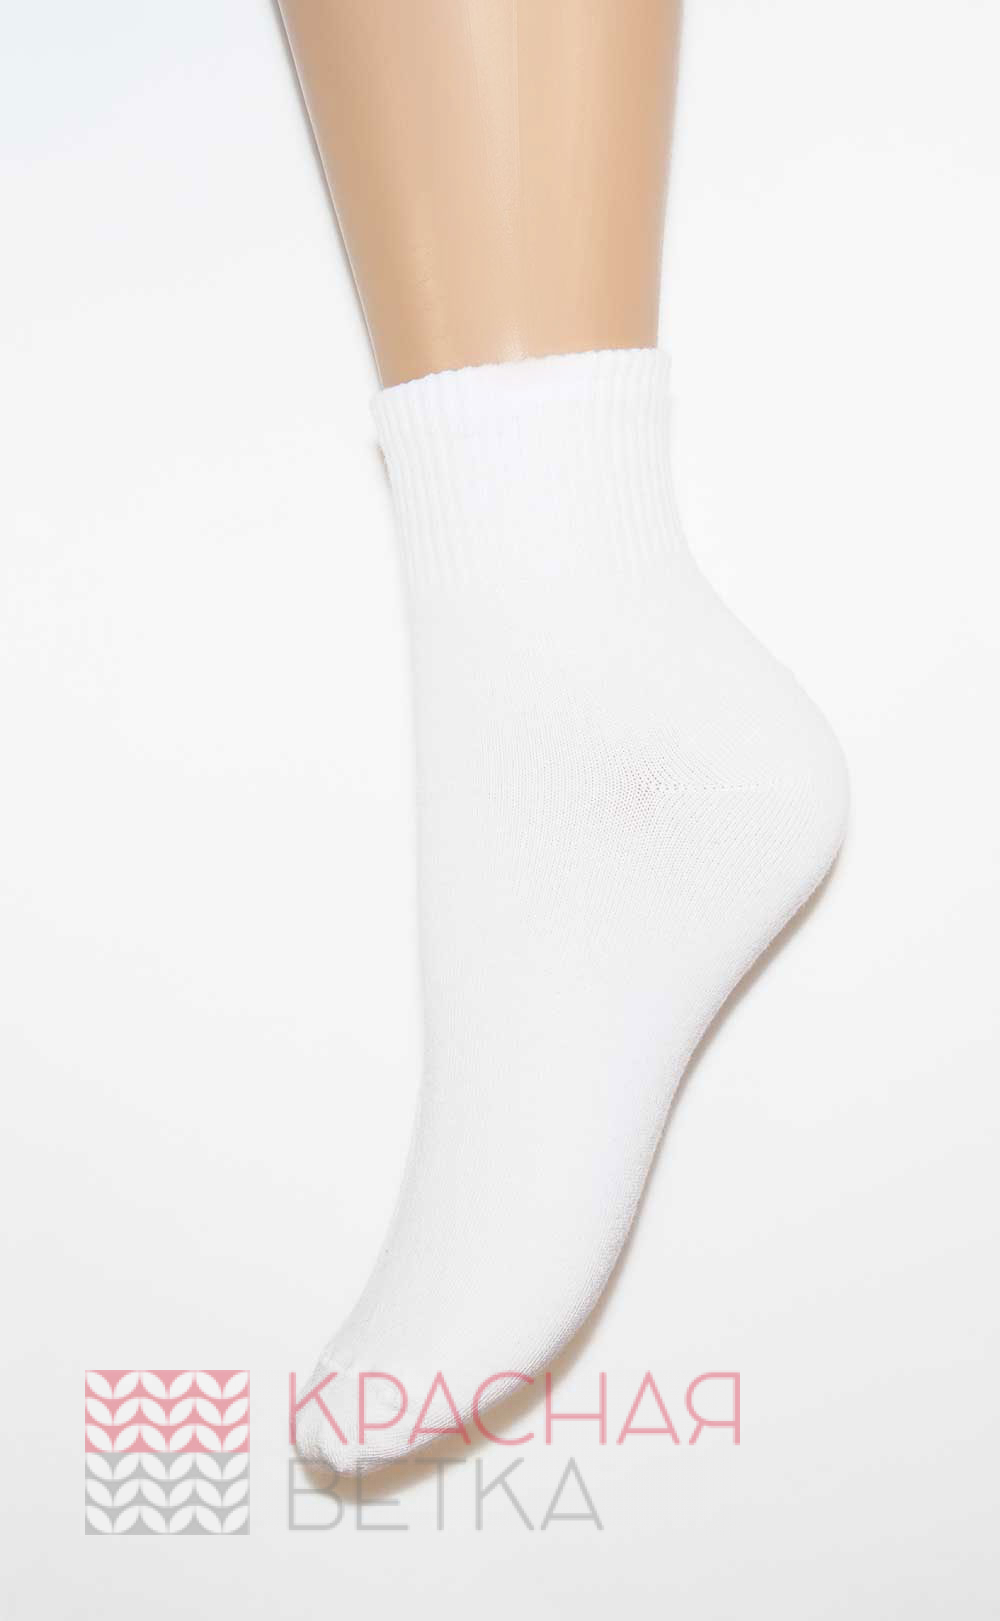 Носки женские Мили (упаковка 10 пар) (23-25) носки мужские гаврюша упаковка 5 пар